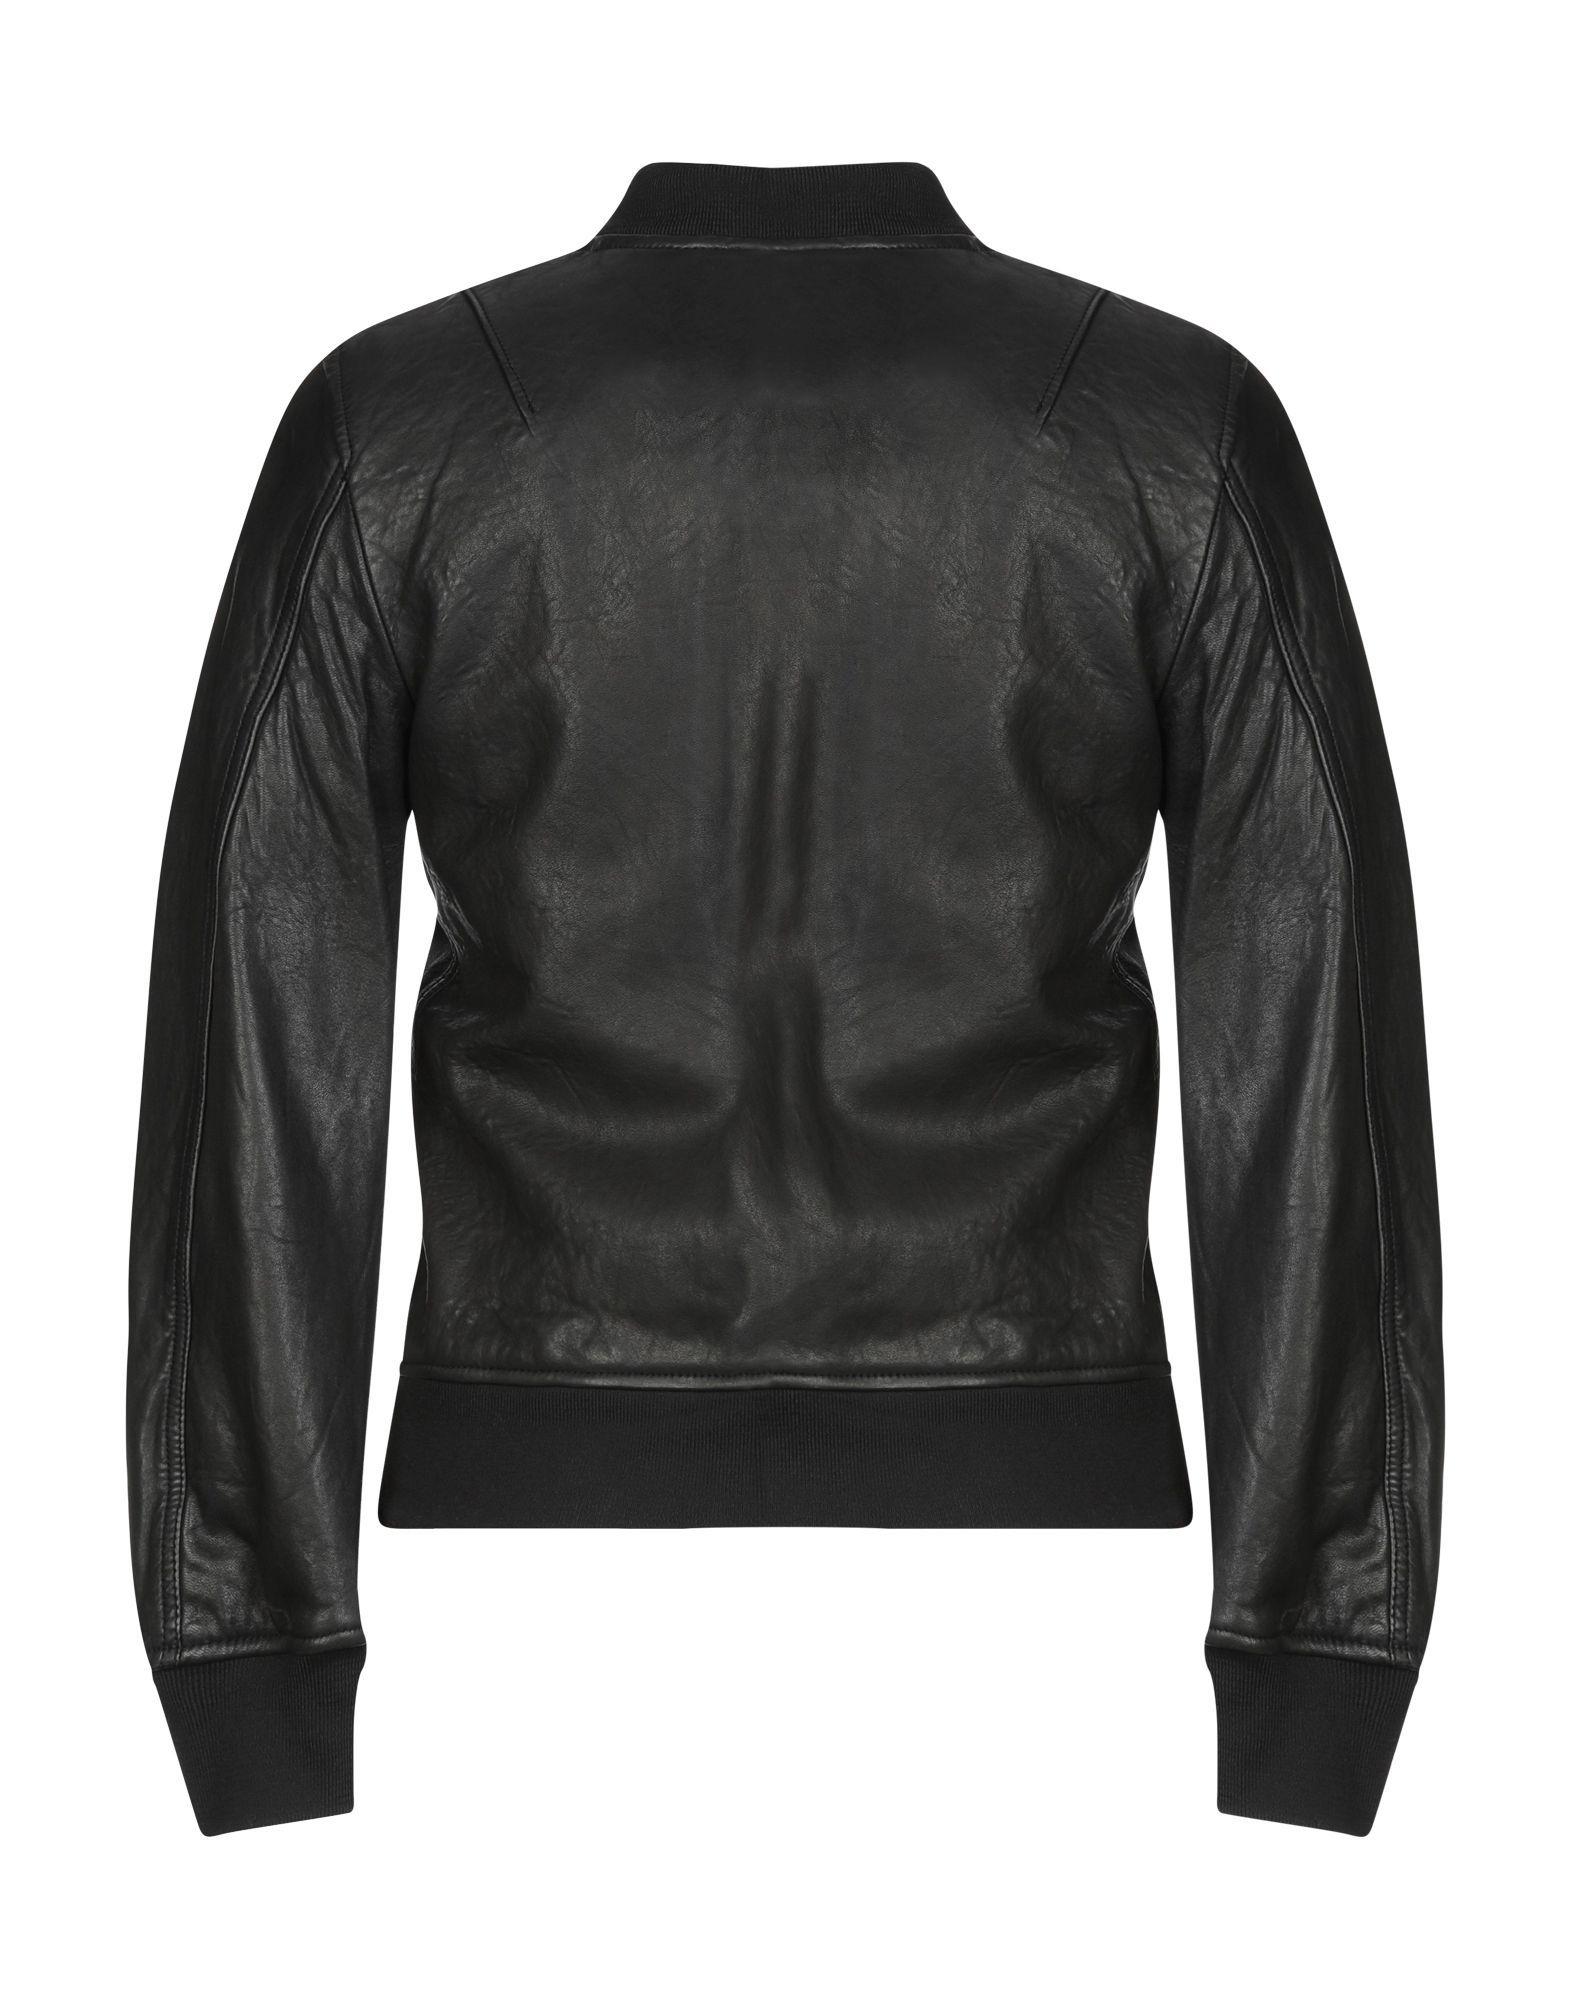 Isabel Marant Etoile Steel Grey Lambskin Leather Jacket